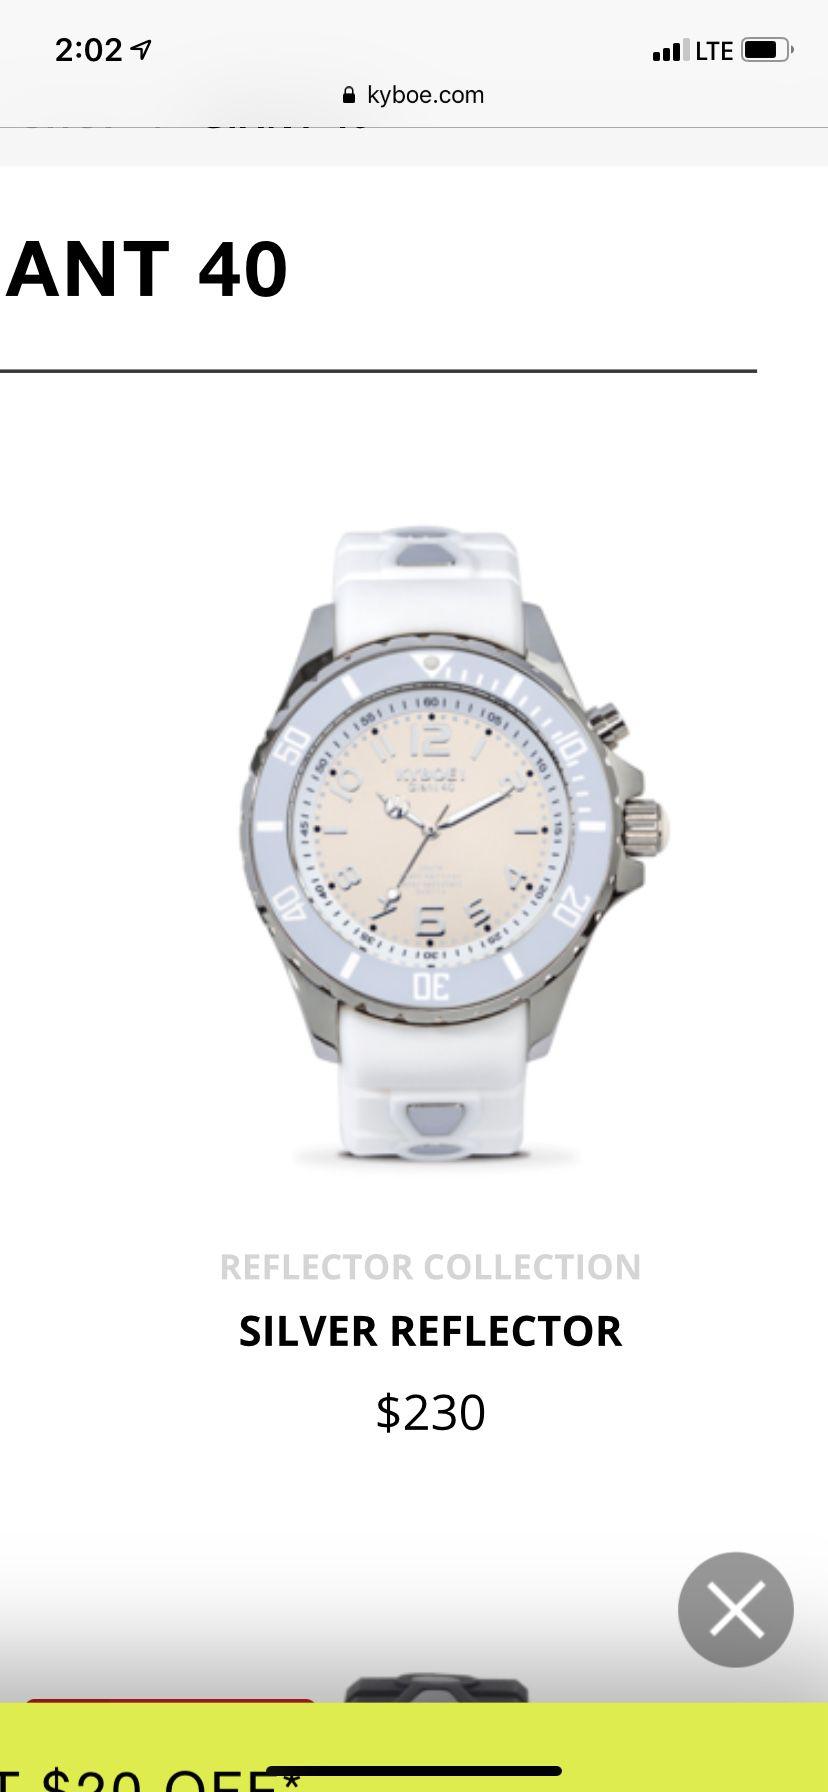 Kyboe! Giant 40 watch